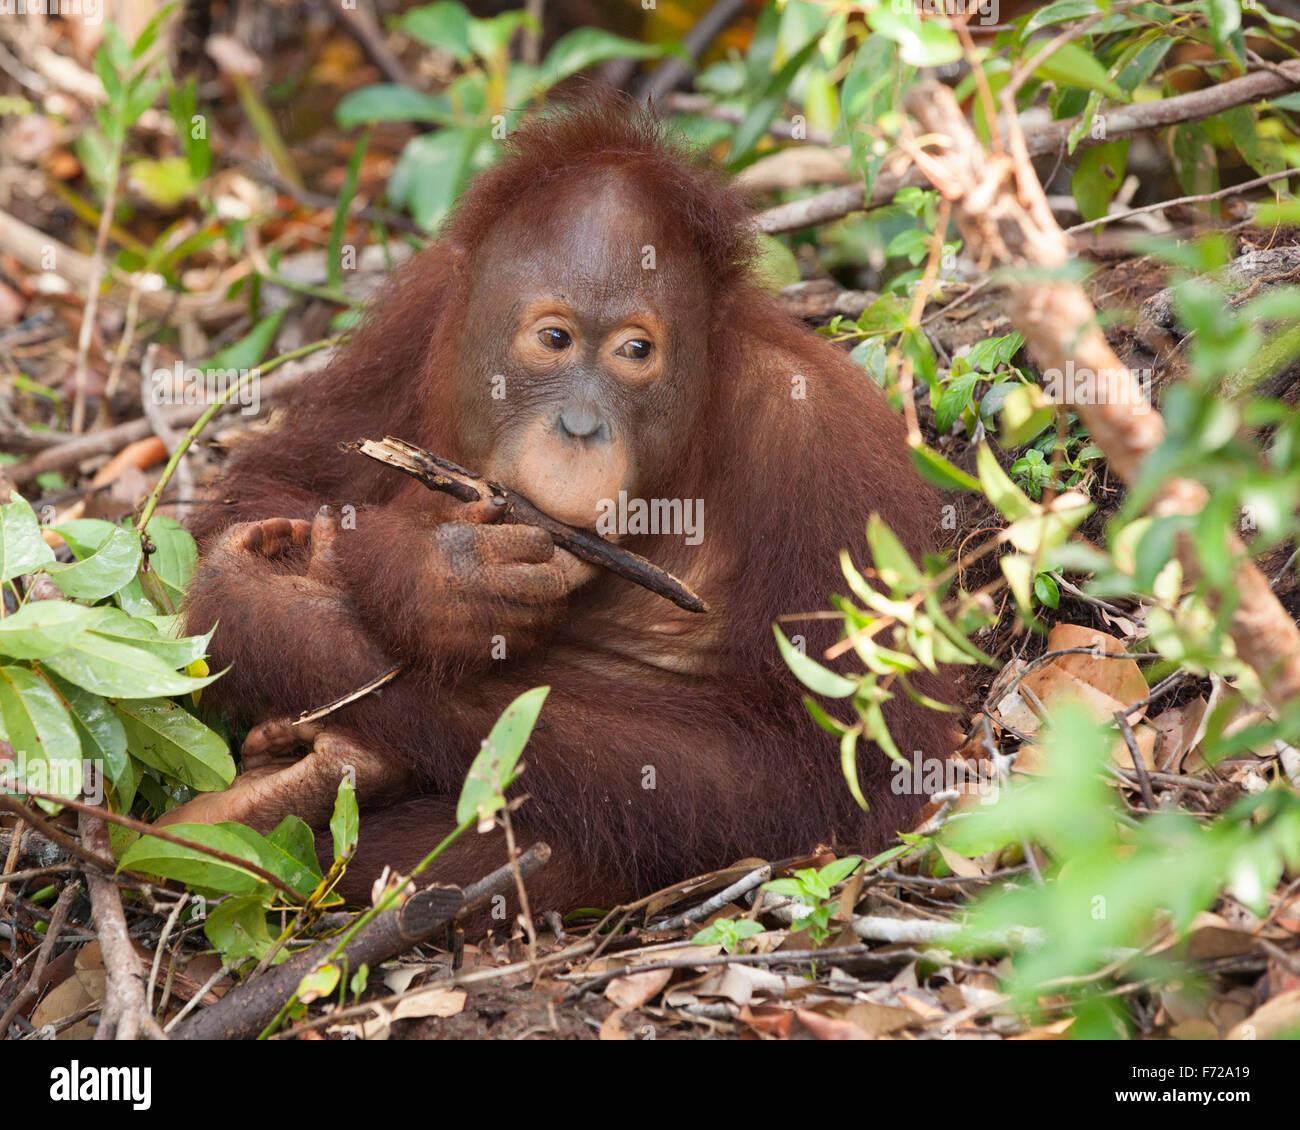 Bornesischen Orang-utan (Pongo pygmaeus) Kauen auf Niederlassung im Wald sitzen Stockbild